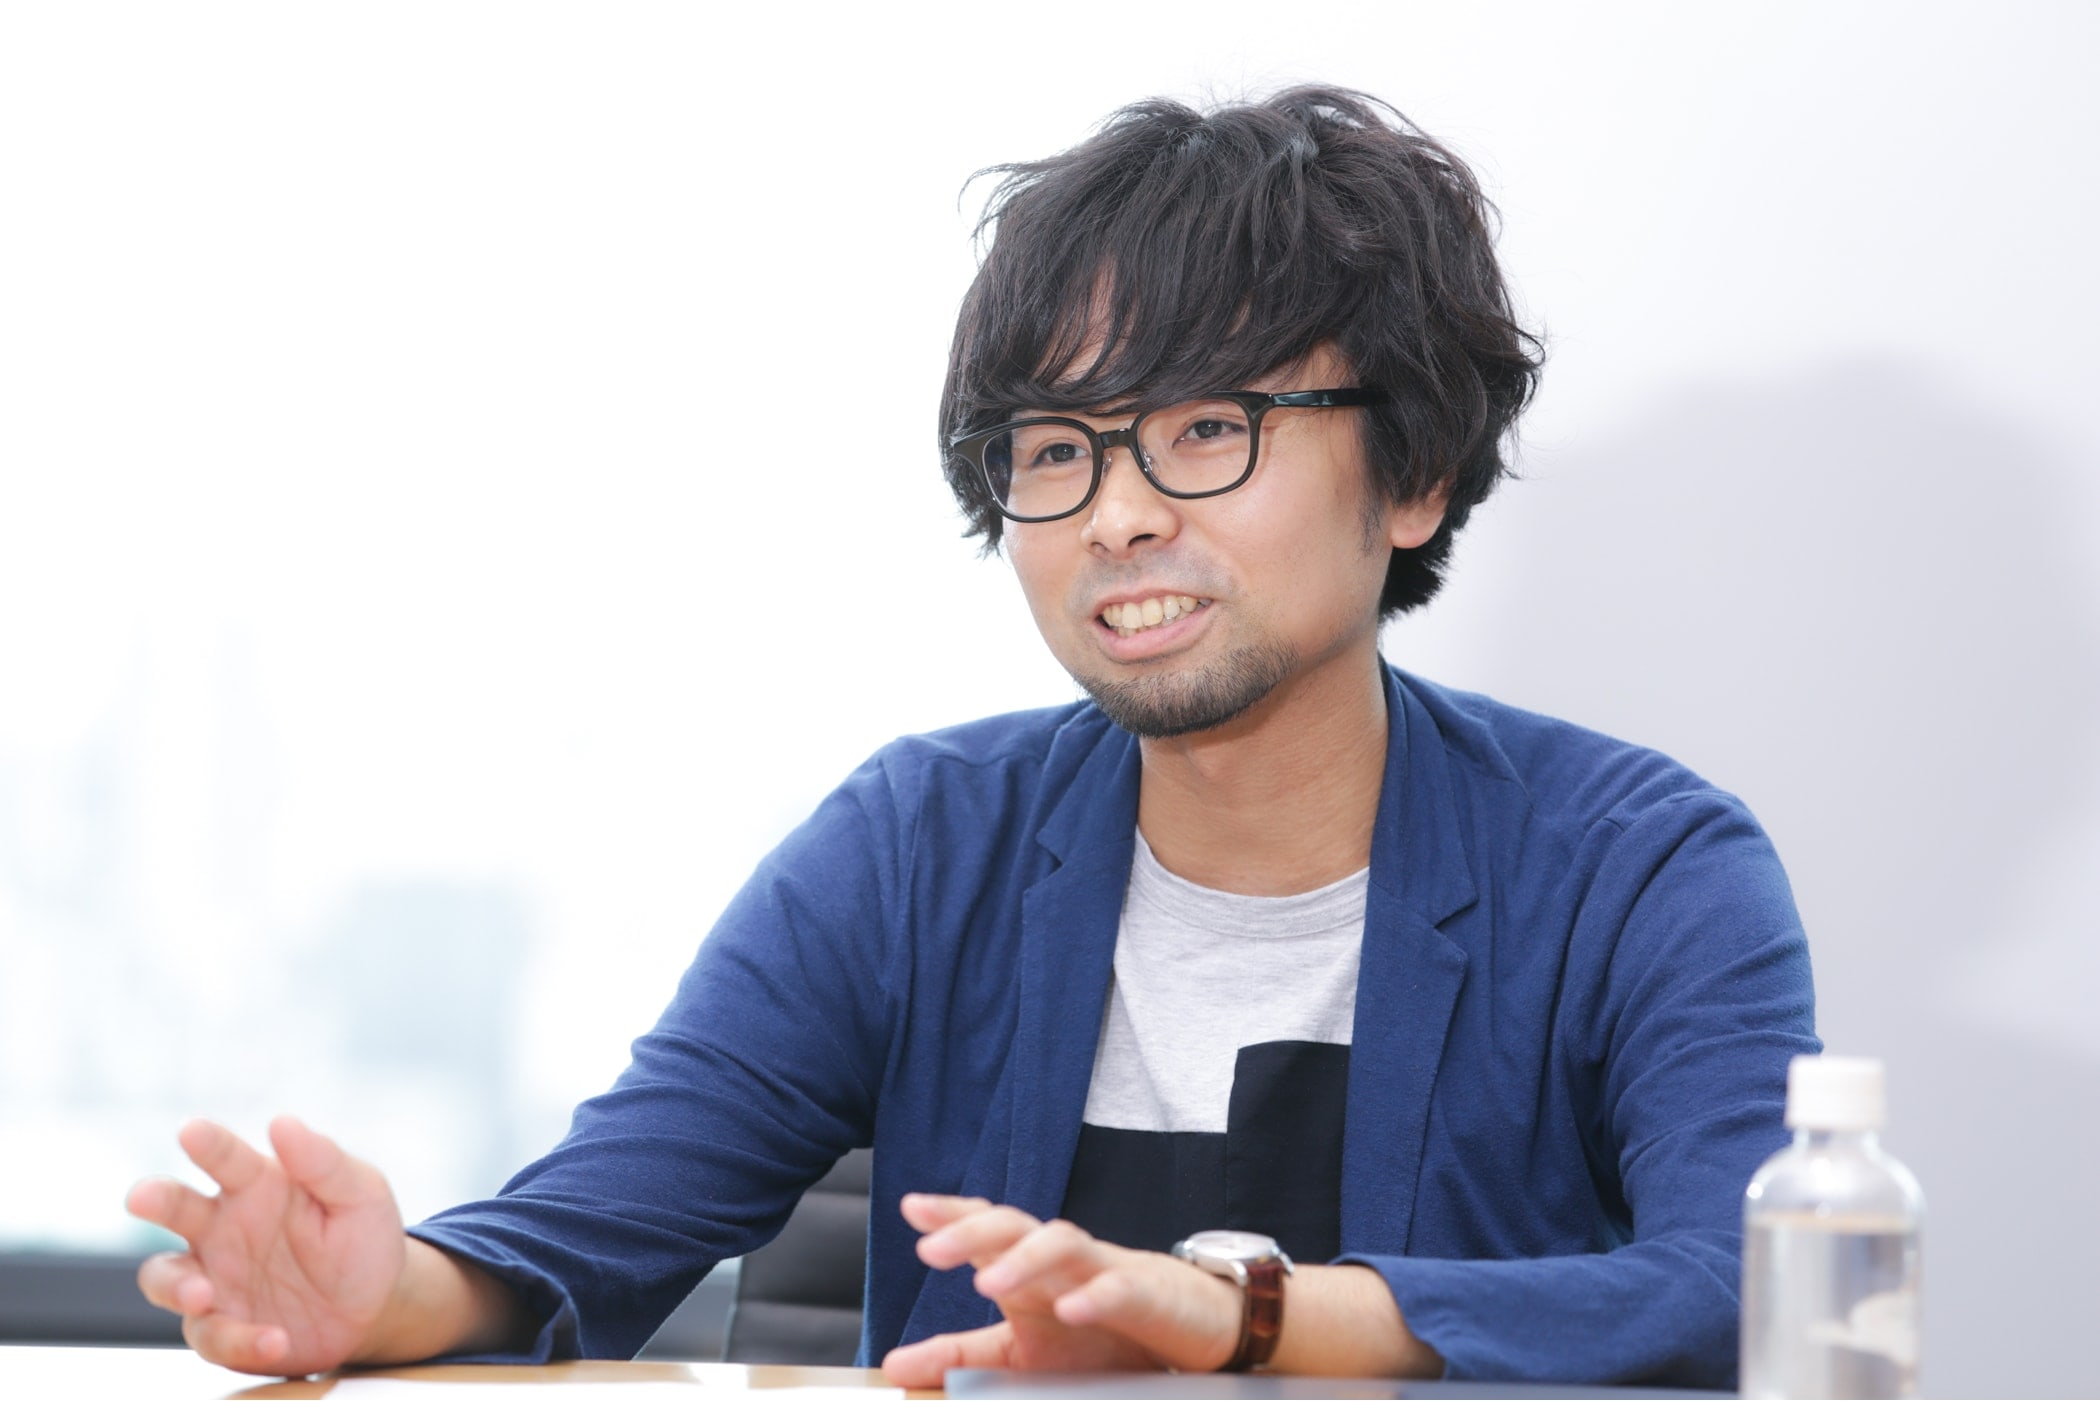 Mr. Shunpei Osawa, Livedoor News Team, 2nd Media Division, LINE Portal Company